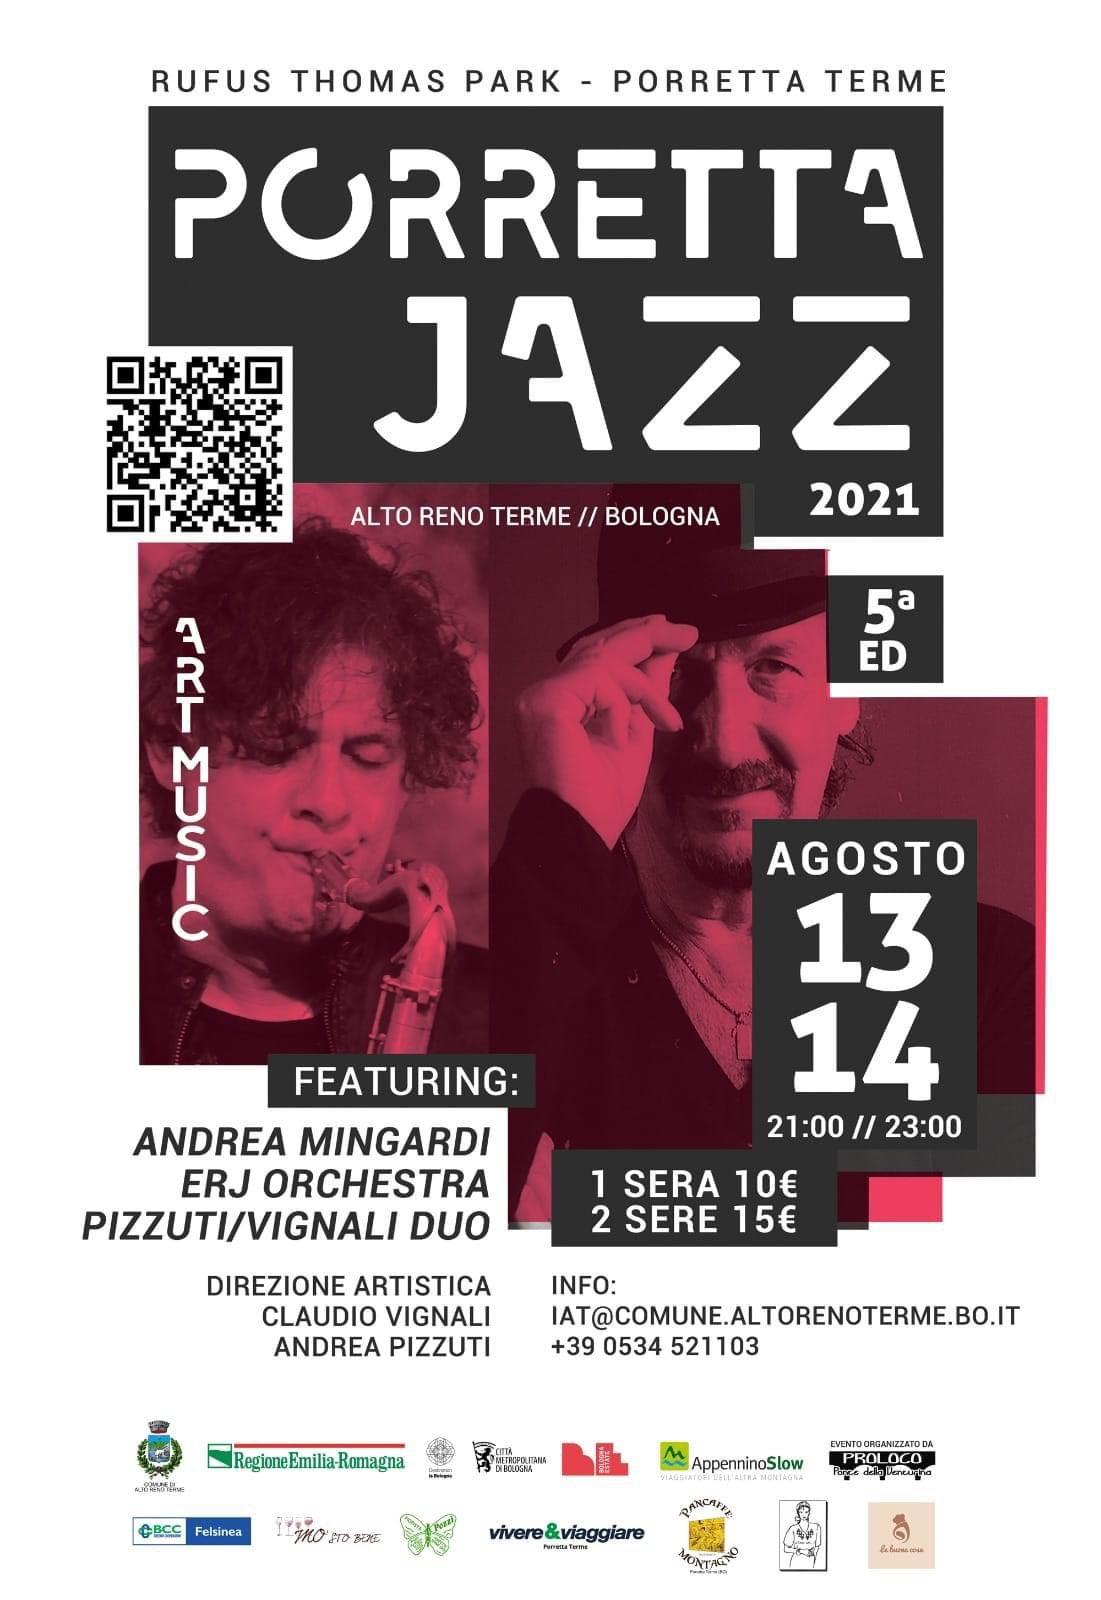 Porretta Jazz Festival 2021 – V edizione